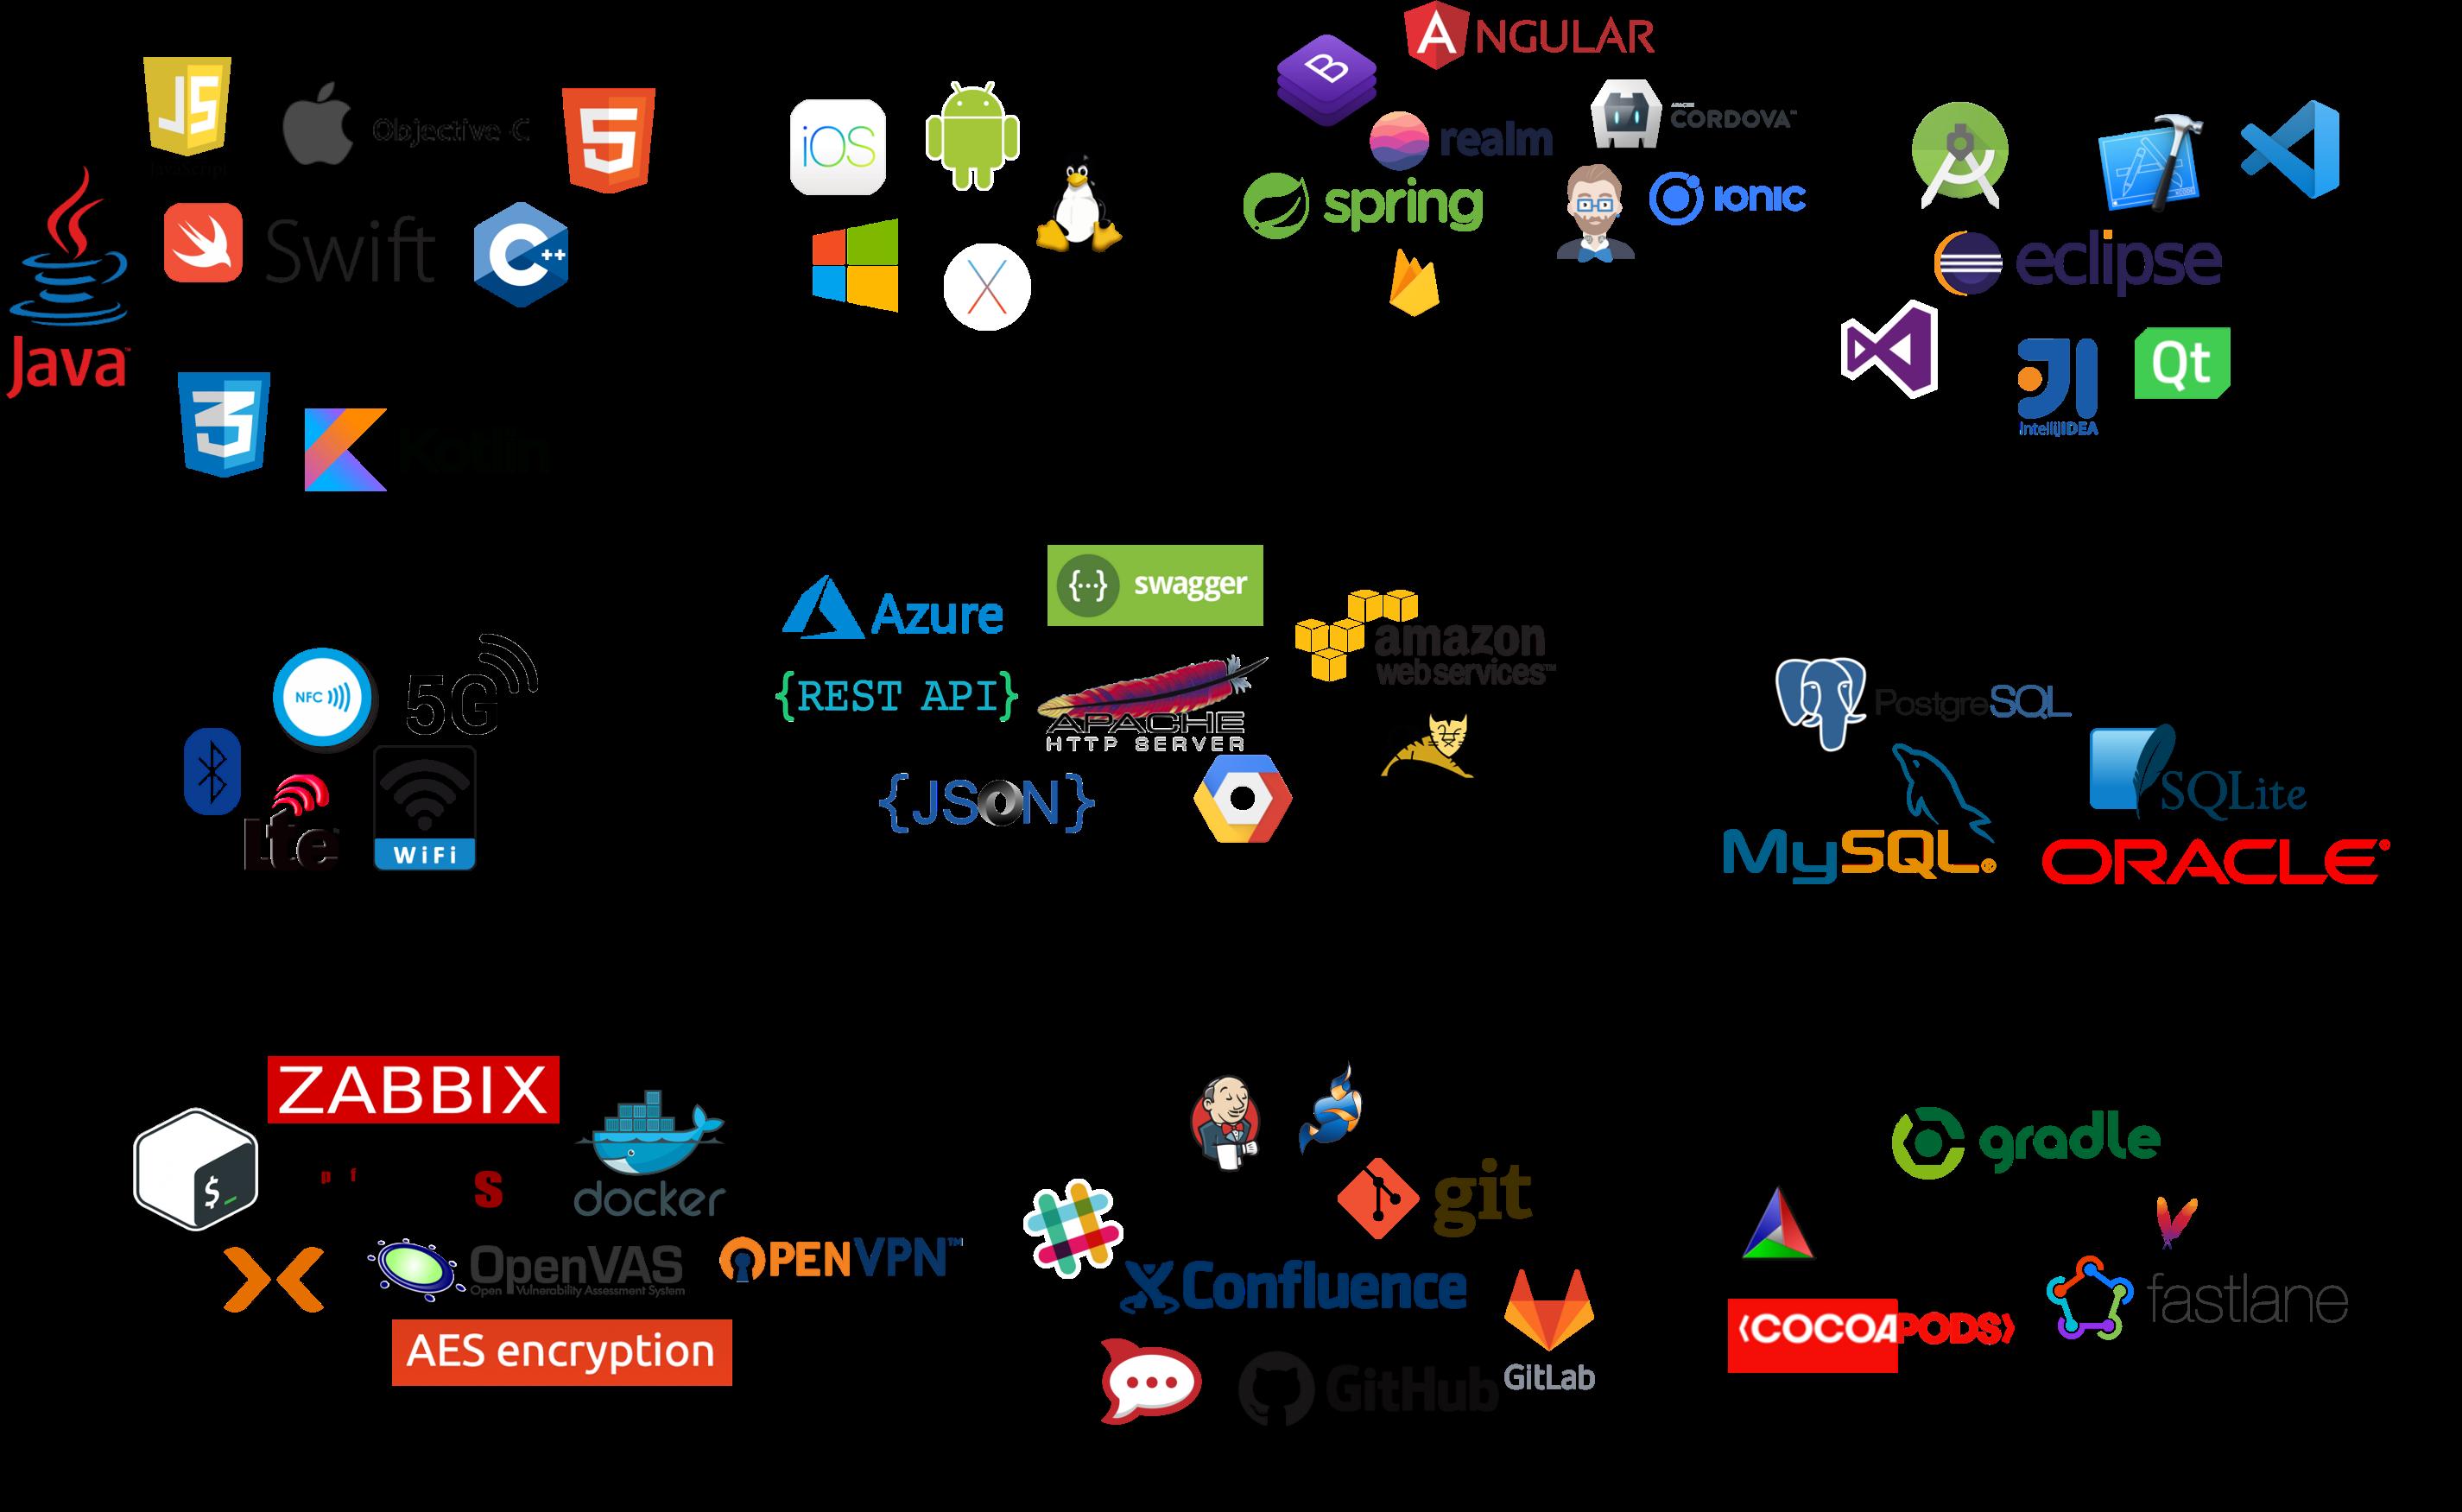 Weptun Technology Cloud: Java, Swift, Objective-C, C++, JavaScript, CSS 3, HTML 5, Kotlin, iOS, Android, Mac OS, Windows, Linux, Spring Boot, Angular, Firebase, Bootstrap, realm, Apache Cordova, Xcode, Android Studio, Eclipse, QT, Intellij, Microsoft Visual Studio, SQLite, Oracle, PostgreSQL, MySQL, Apache HTTP Server, Apache Tomcat, Google Cloud Platform, Amazon Web Services, REST, JSON, swagger, LTE, Bluetooth, NFC, WiFi, Docker, pfSense, ObenVAS, OpenVPN, Proxmox Virtual Environment, Zabbix, Shell, Maven, grade, fastlane, CocoaPods, CMake, GitHub, git, Confluence, GitLab, Jenkins, RocketChat, Slack, AES, Azure, Visual Studio Code, Jitsi, 5G